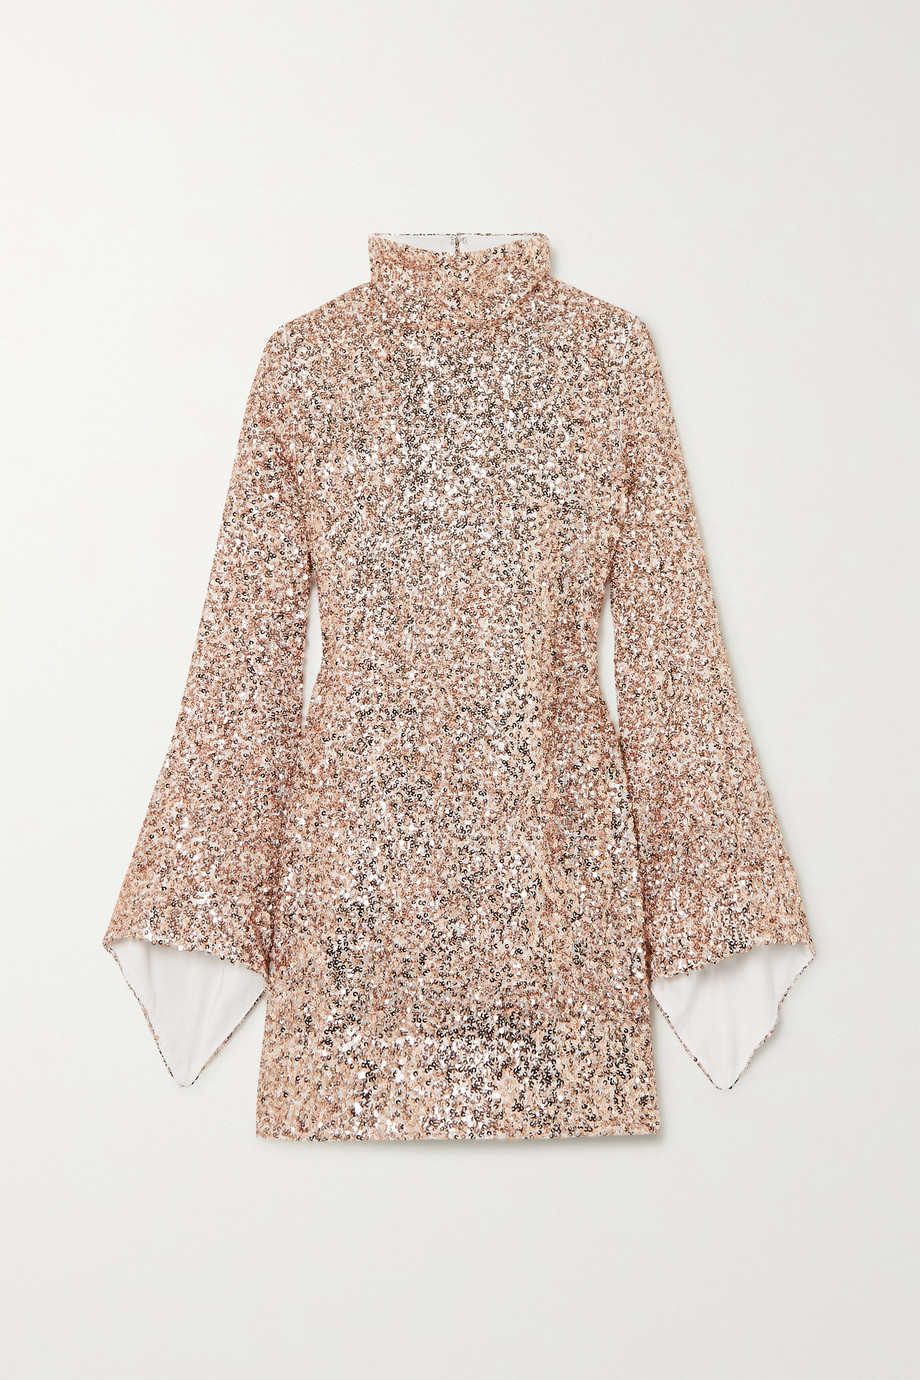 Halpern Draped sequined georgette mini dress